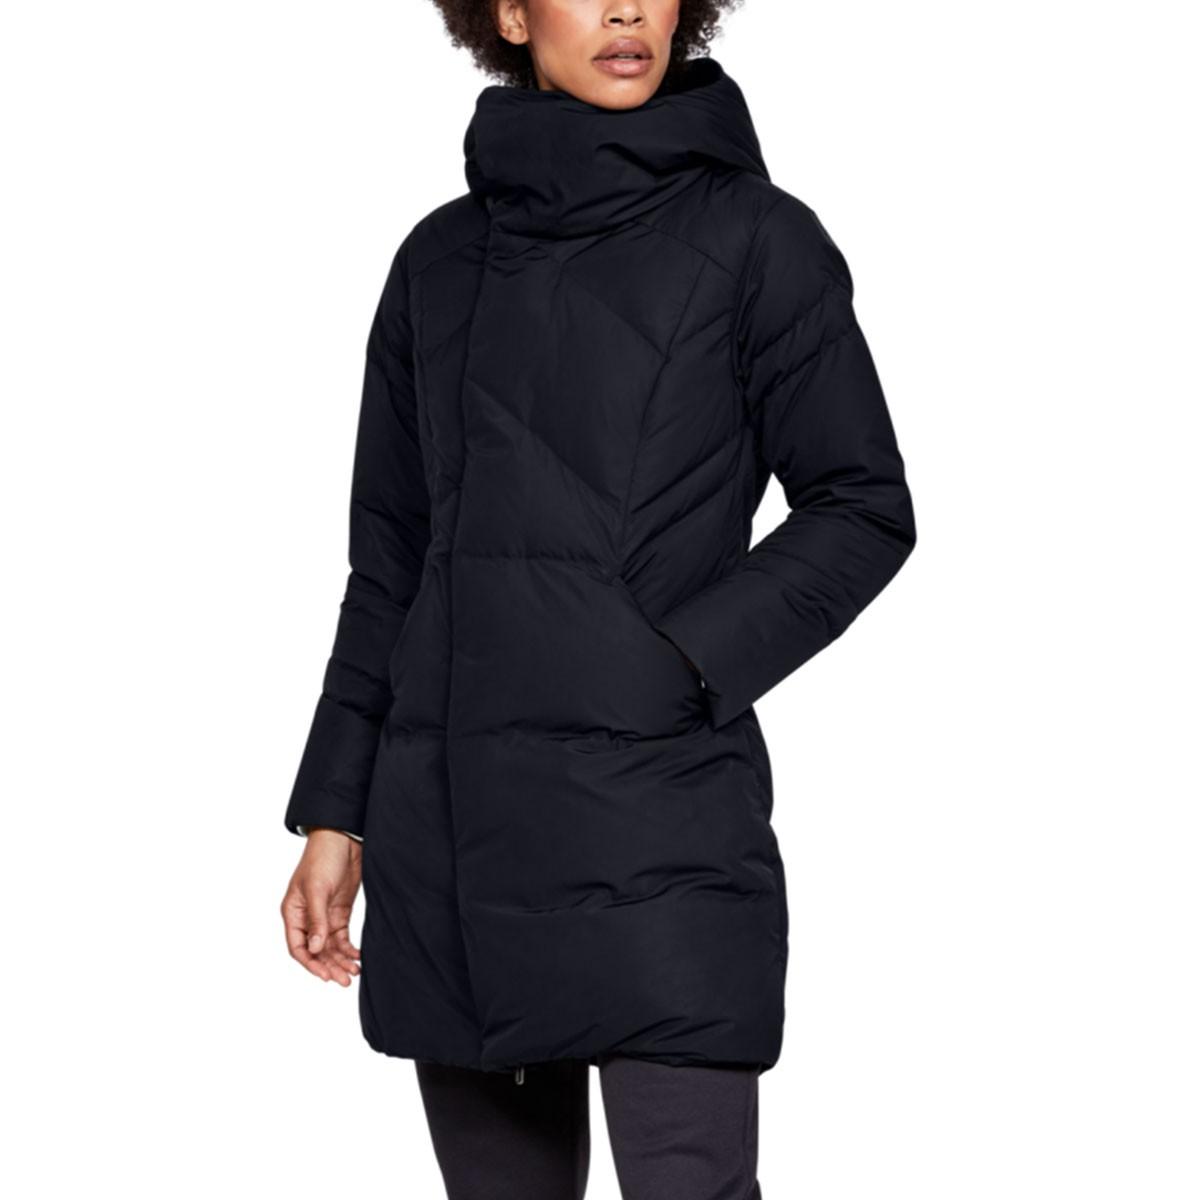 UNDER ARMOUR 安德玛 1346480001 女子长款保暖羽绒外套